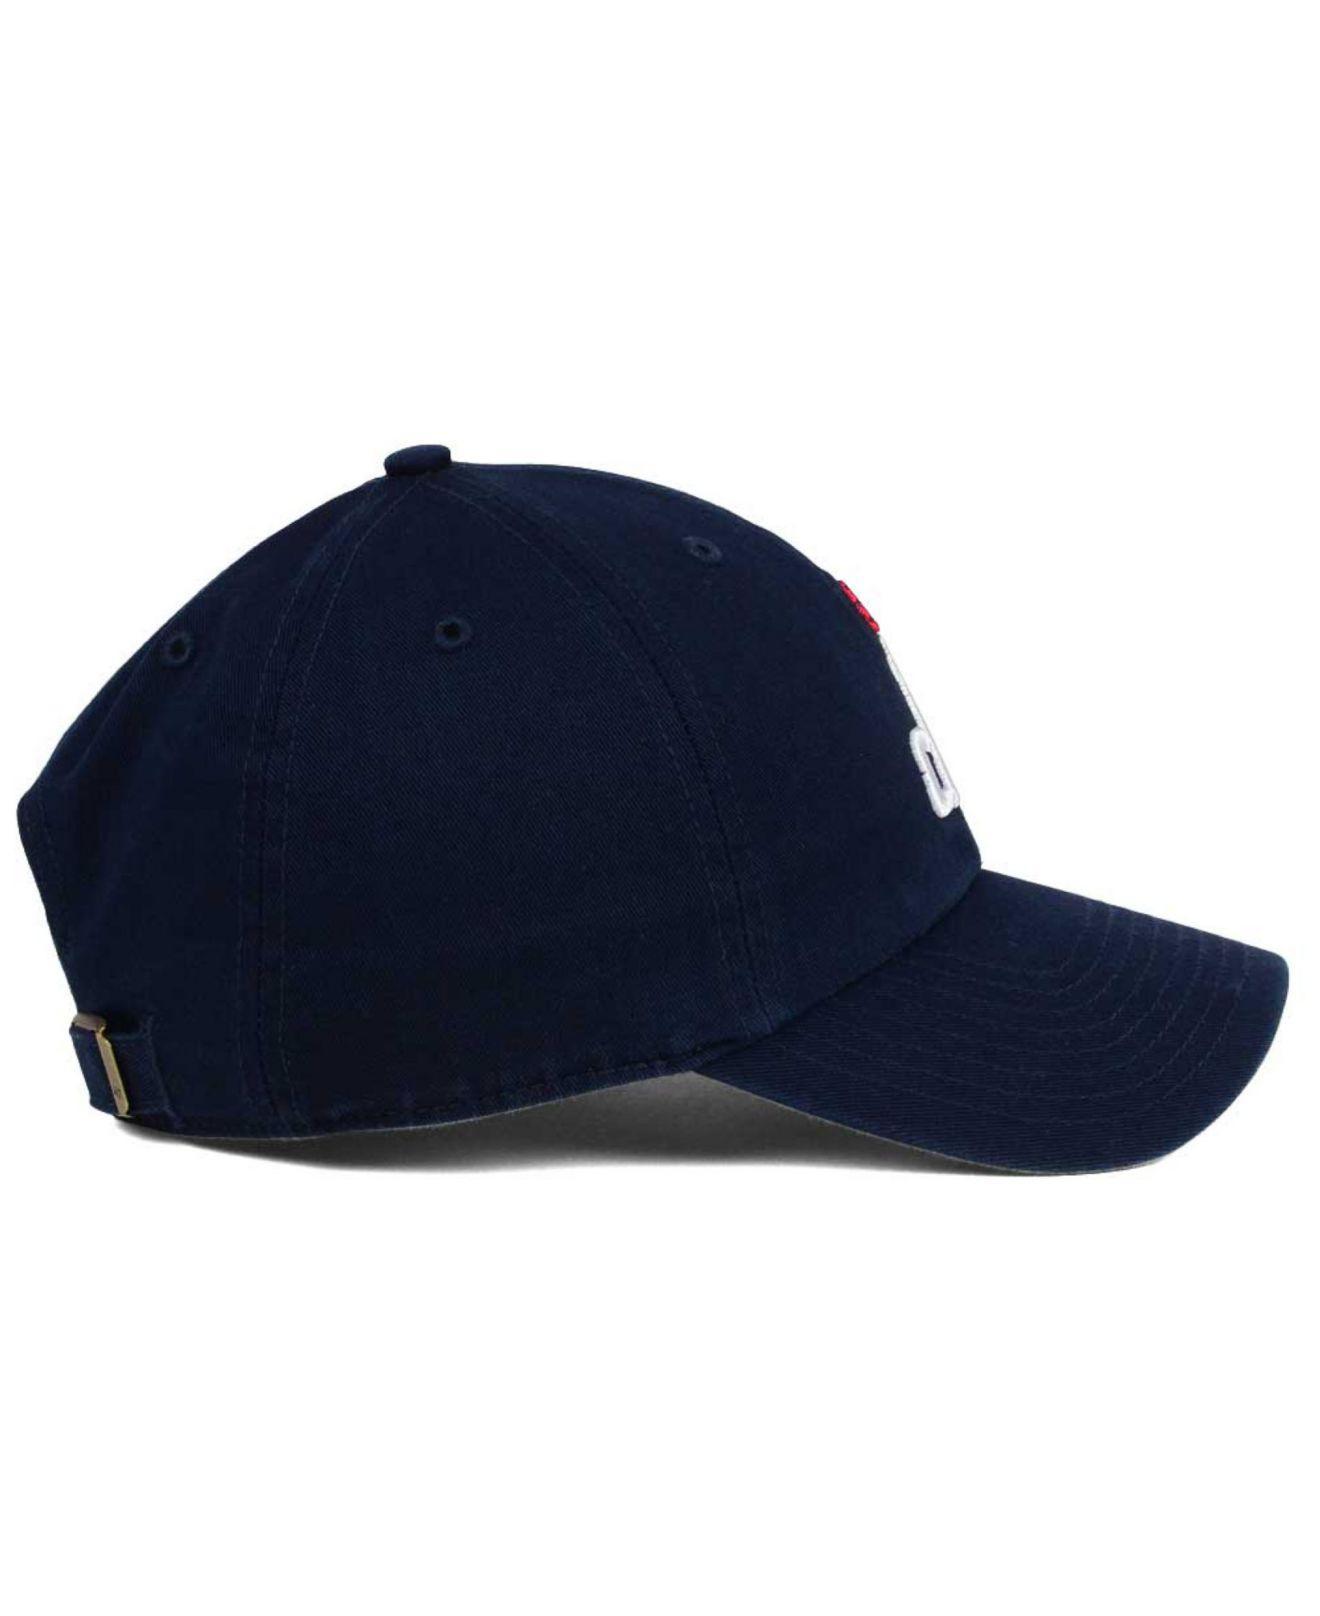 finest selection 7ea6b fd86d australia navy mens washington wizards 47 nba 47 clean up cap 20905766  39b25 2e4f4  where to buy 47 brand blue washington wizards clean up cap for  men lyst. ...